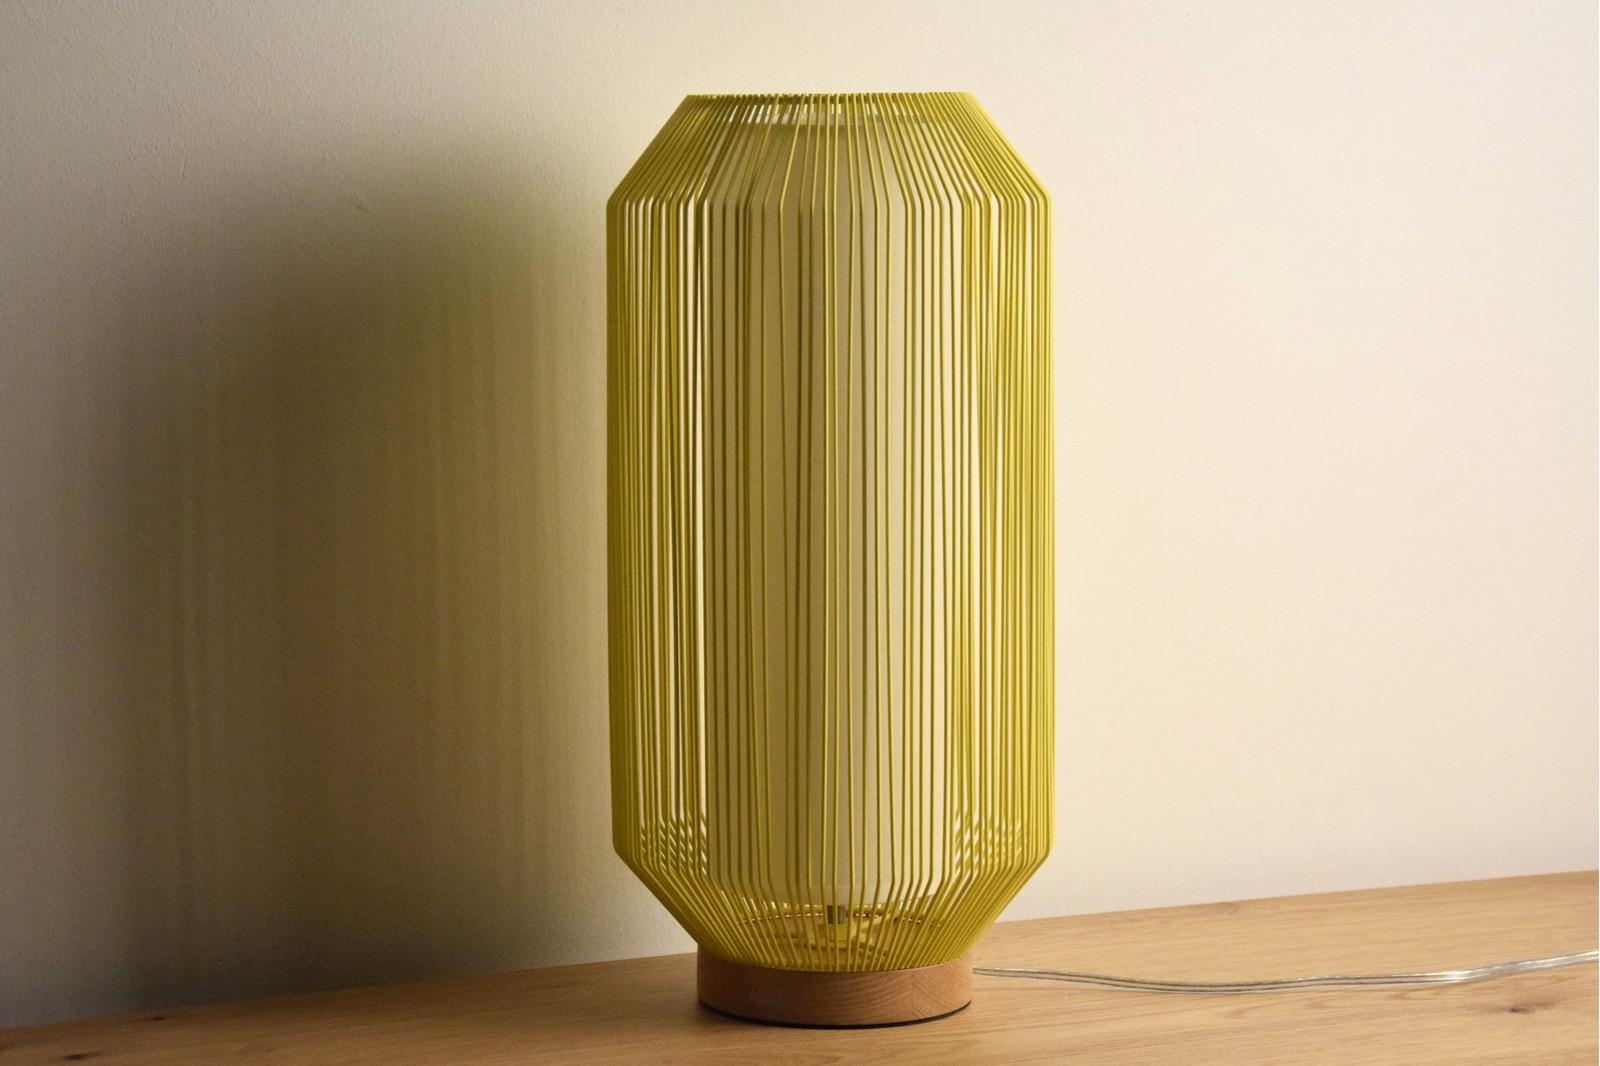 YELLOW METAL TABLE LAMP. BIG